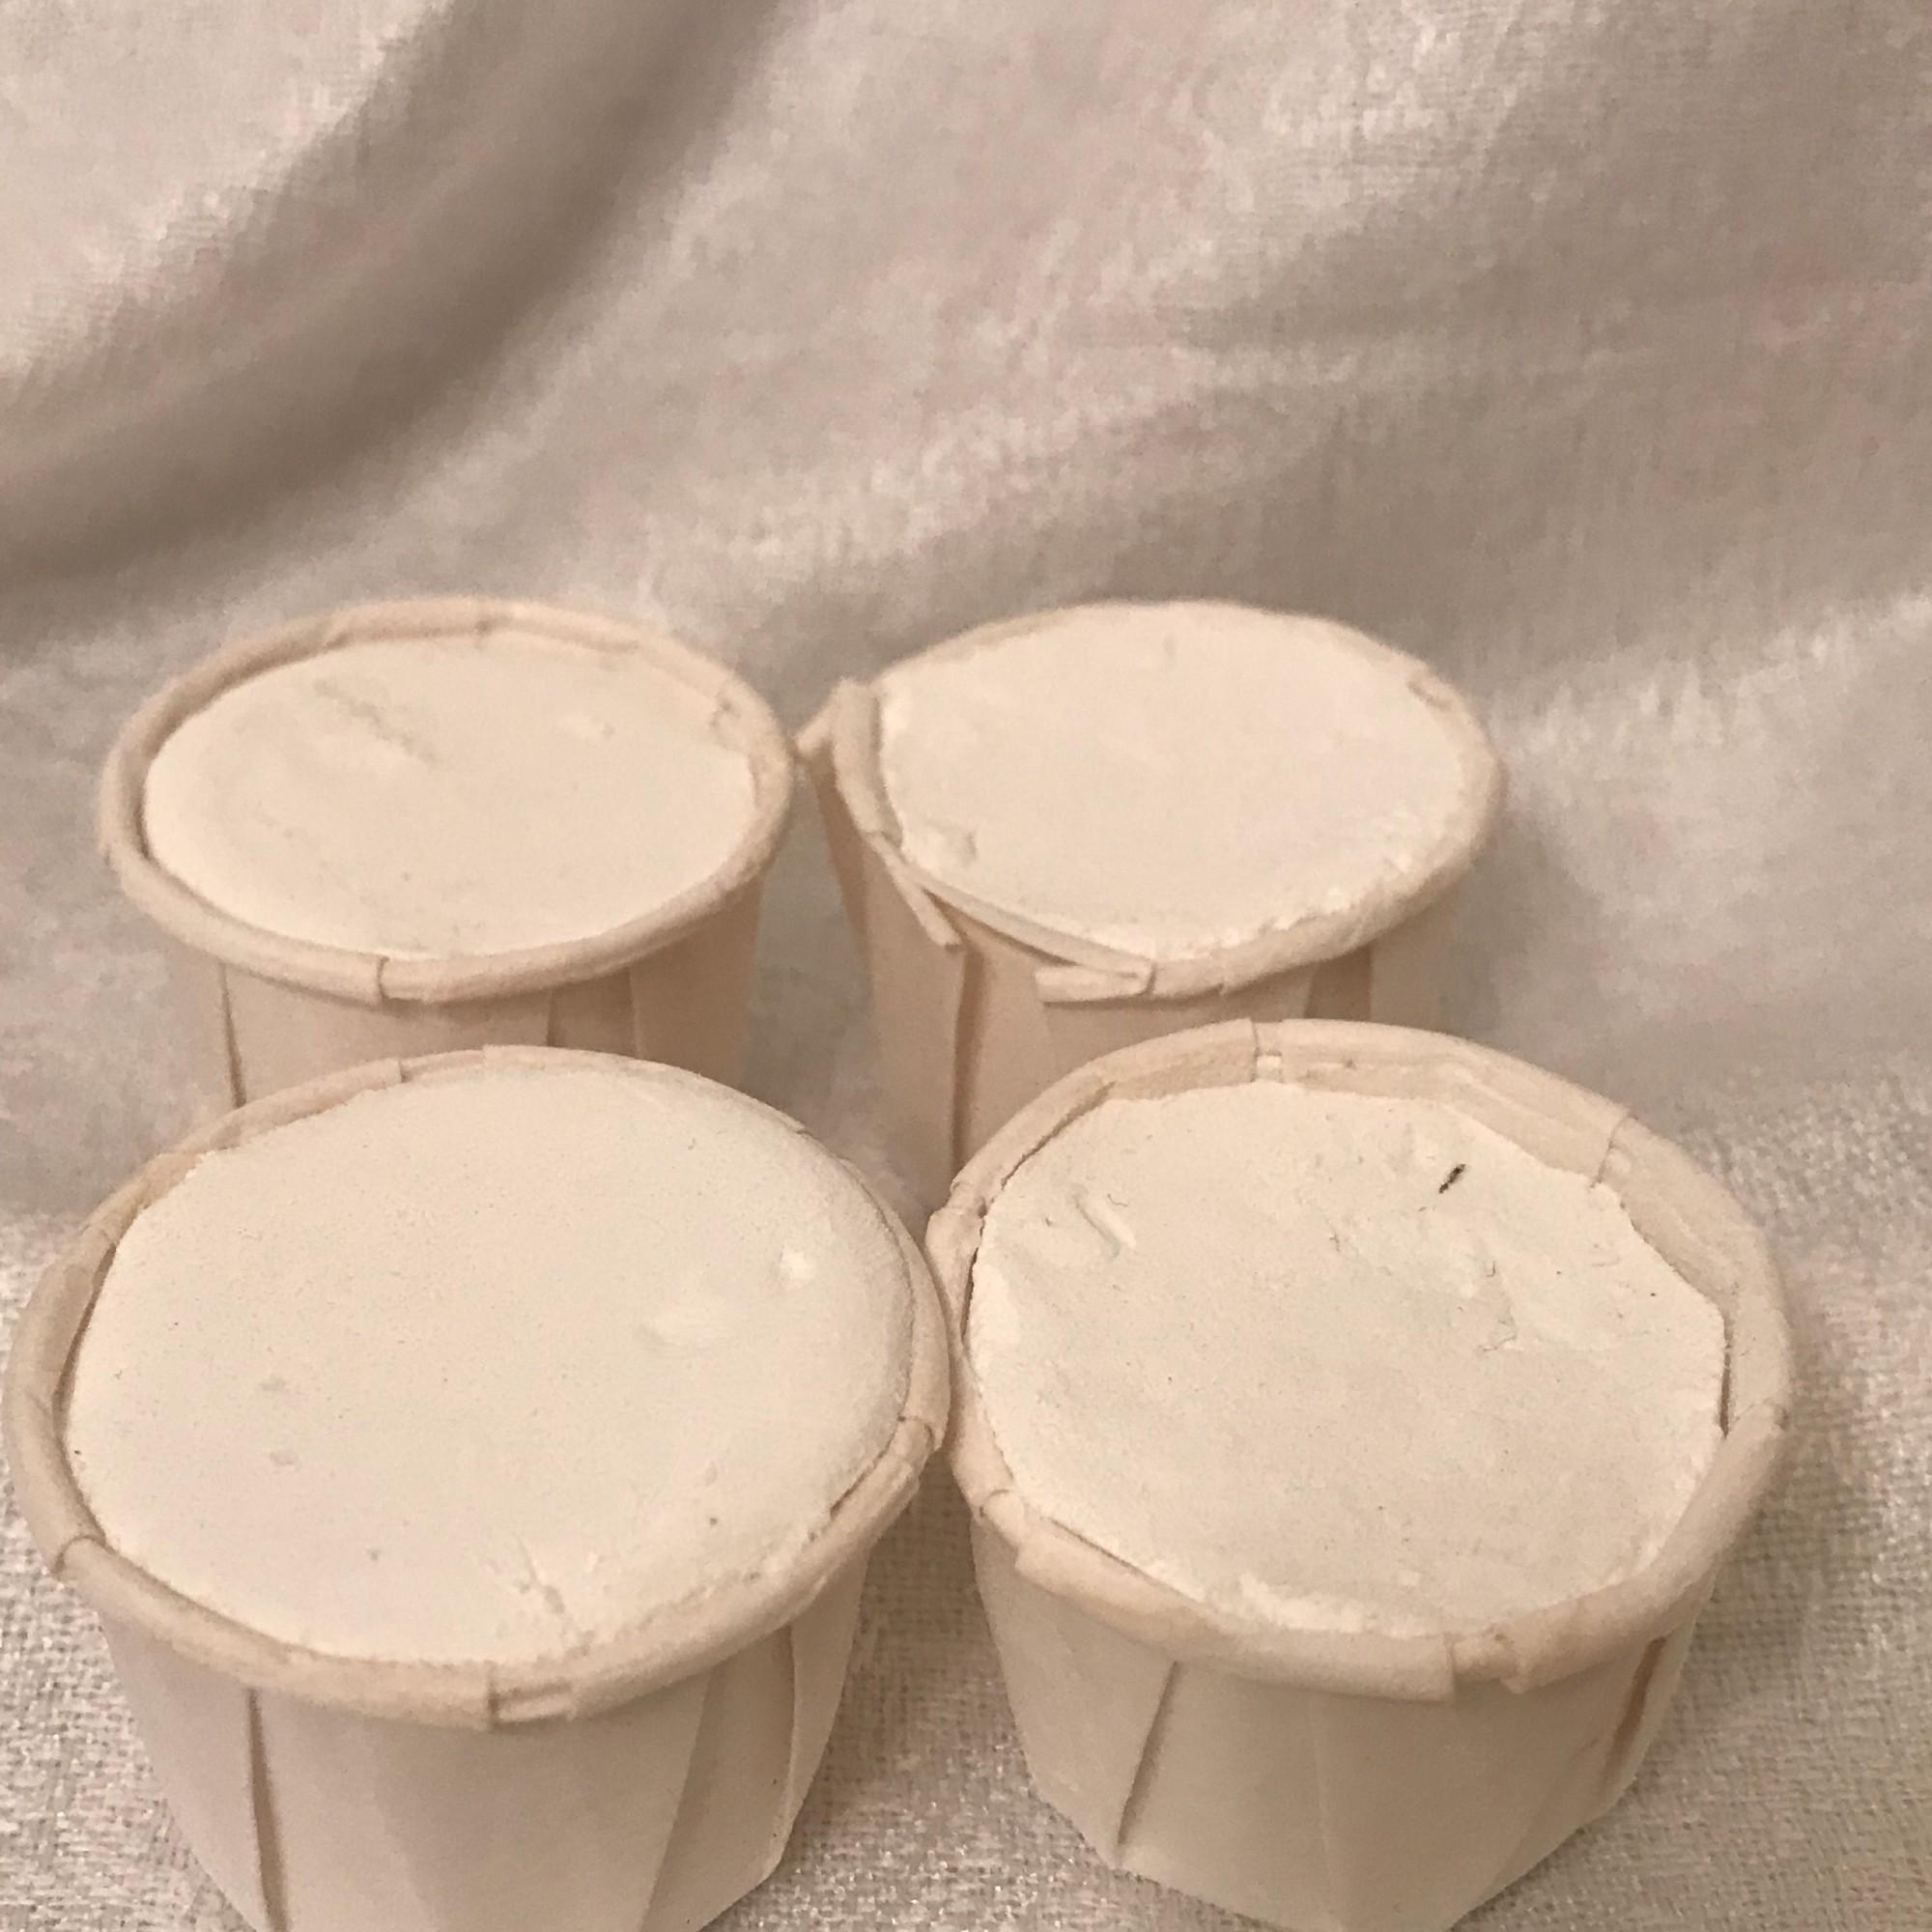 5 Pack. Cascarilla.Powdered egg shell